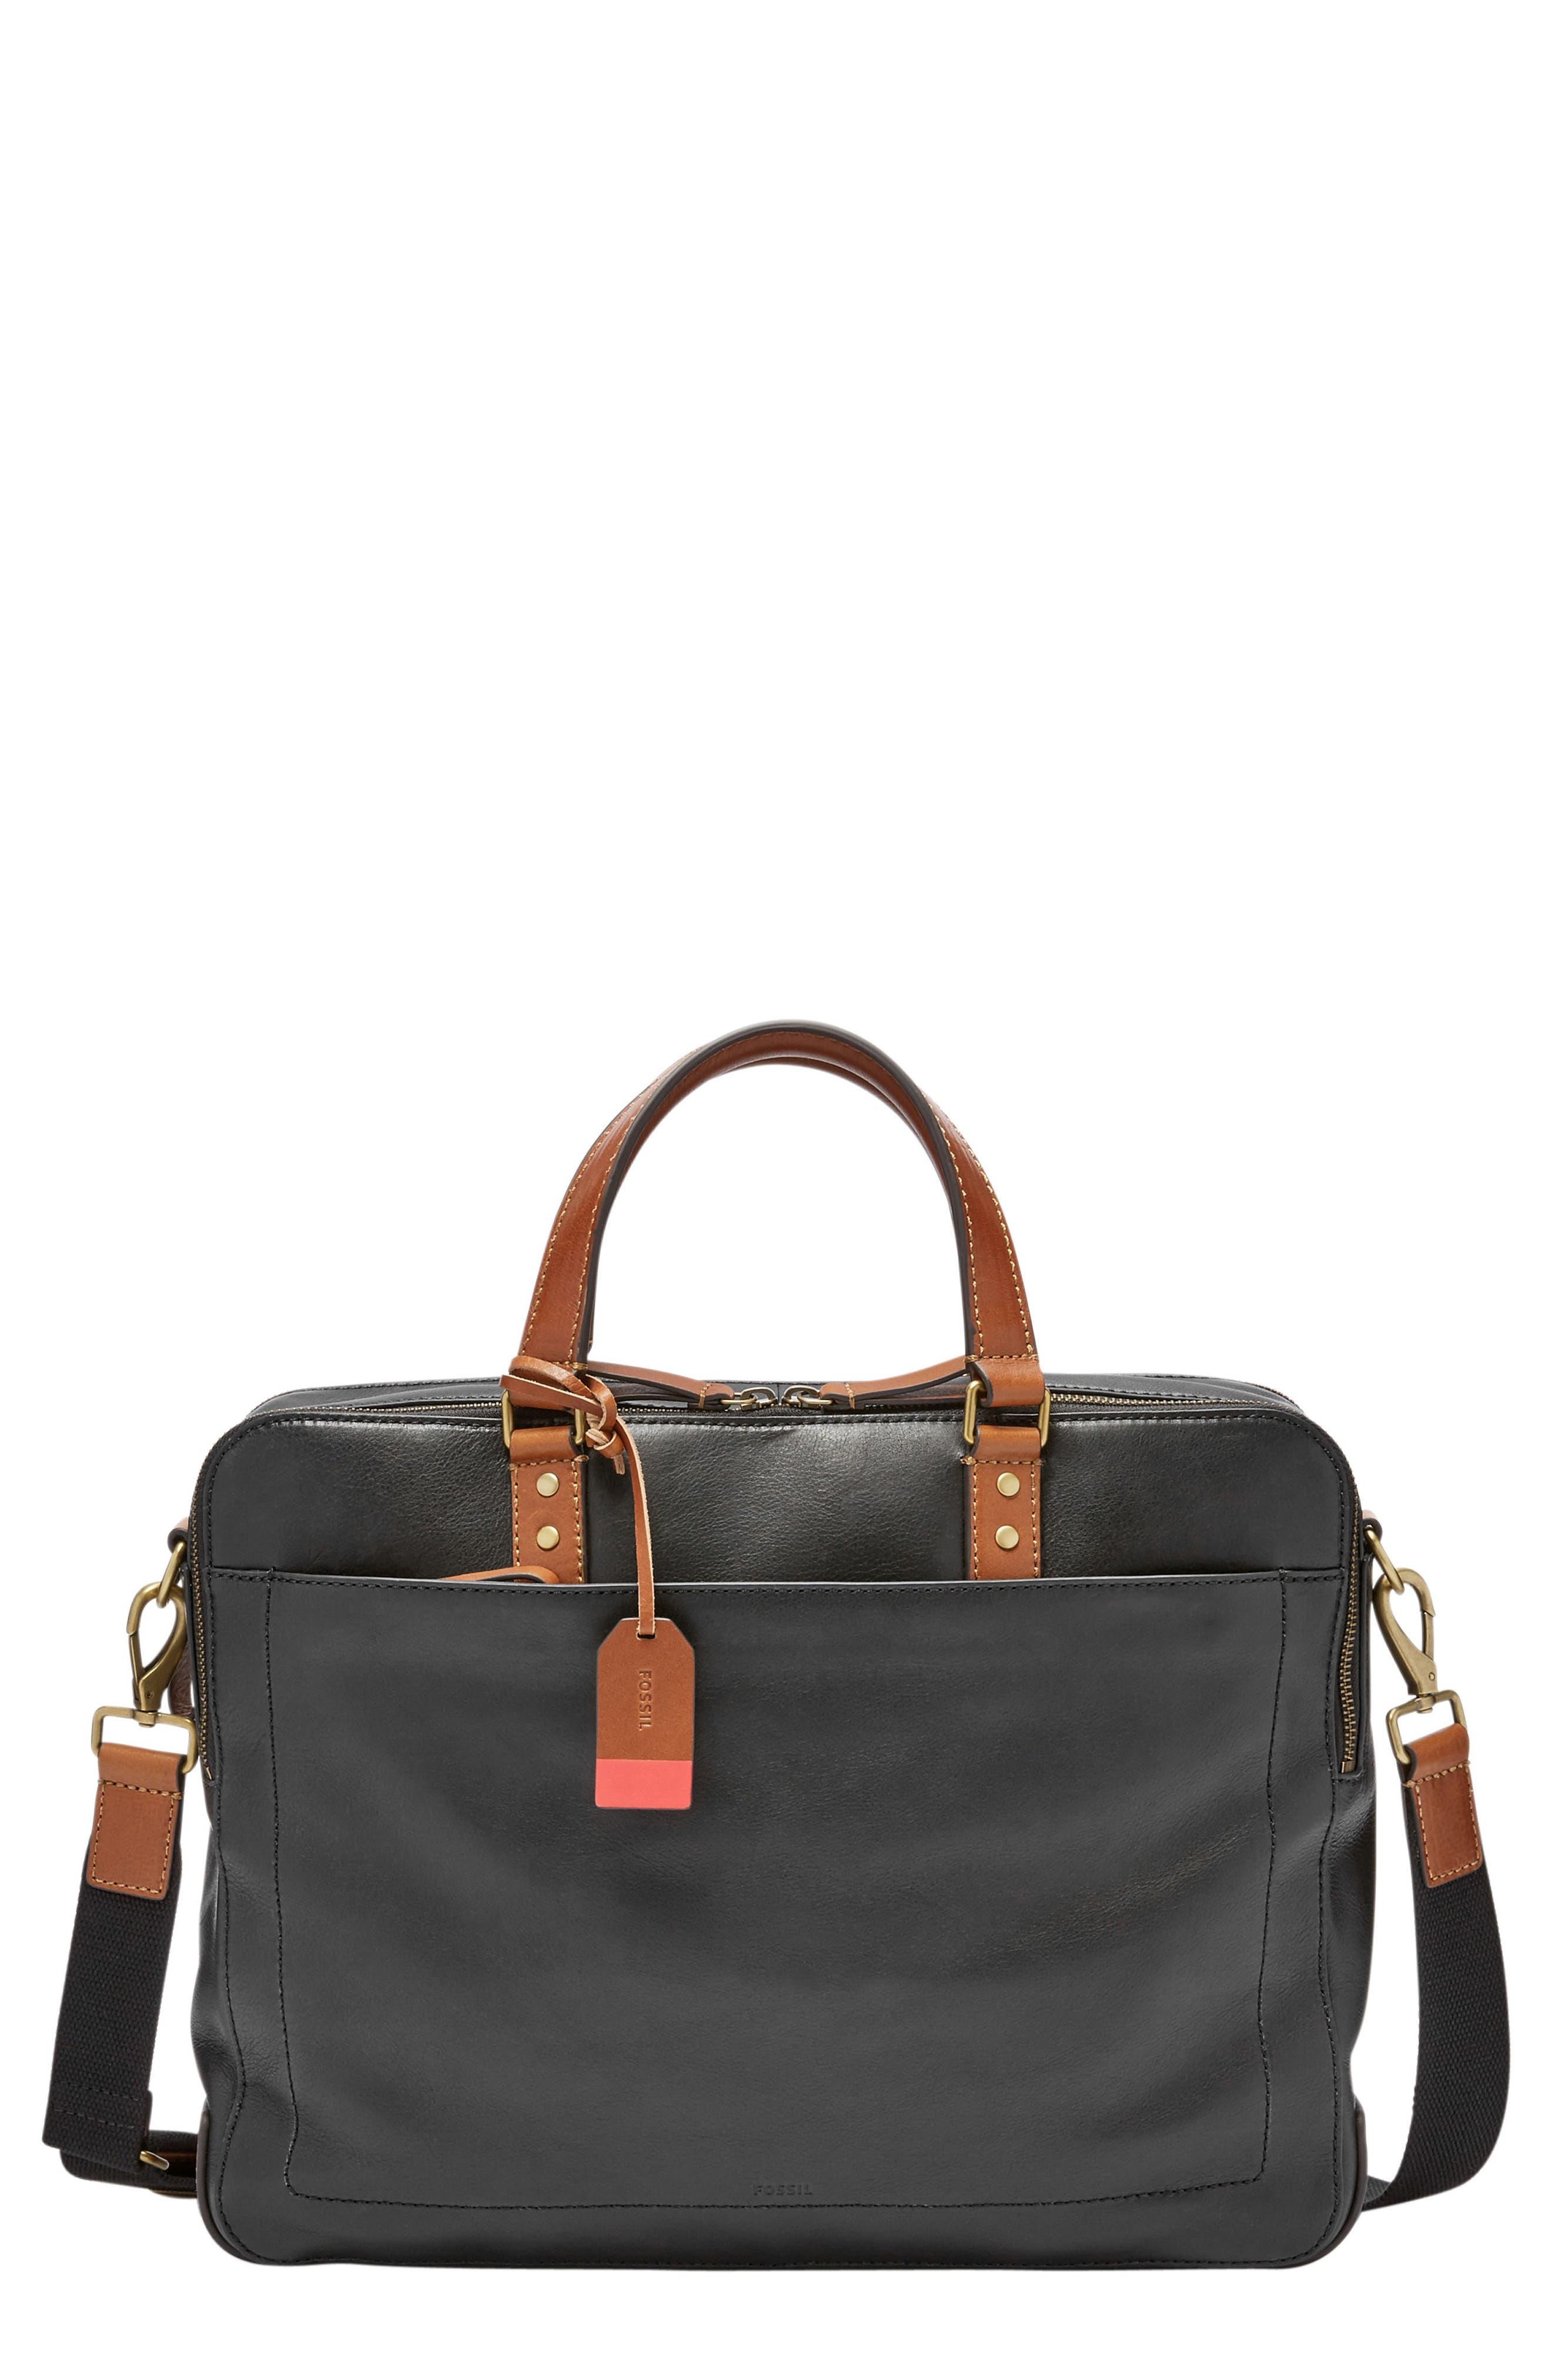 Defender Leather Briefcase,                             Main thumbnail 1, color,                             Black